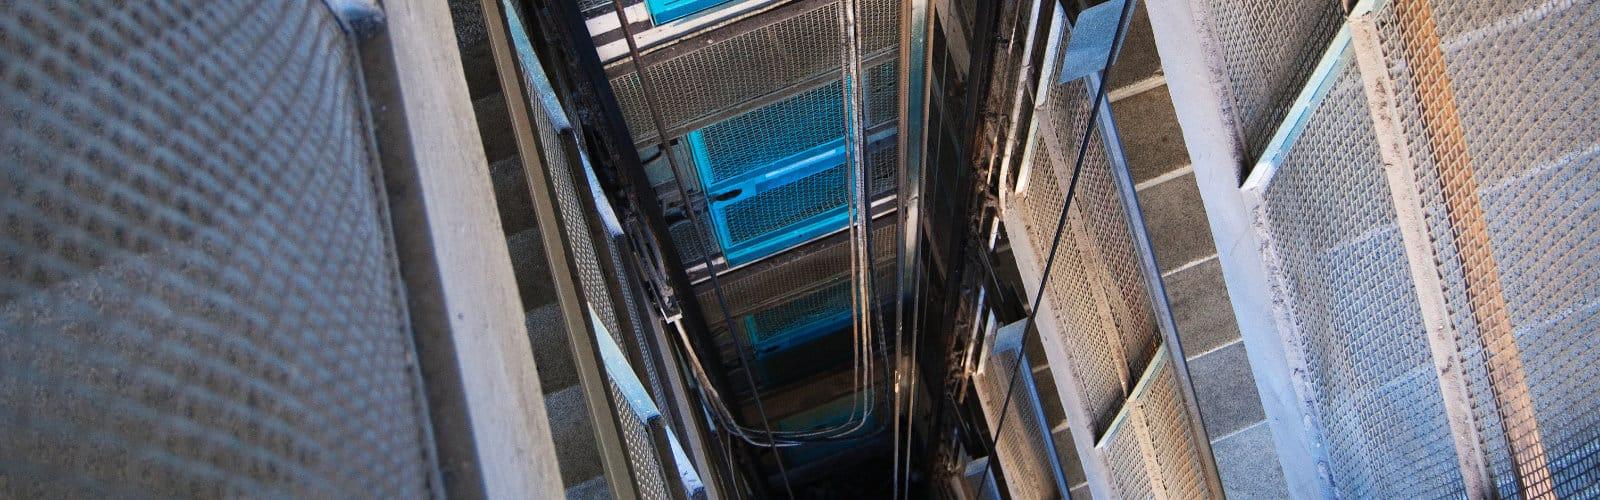 elevator shaft image